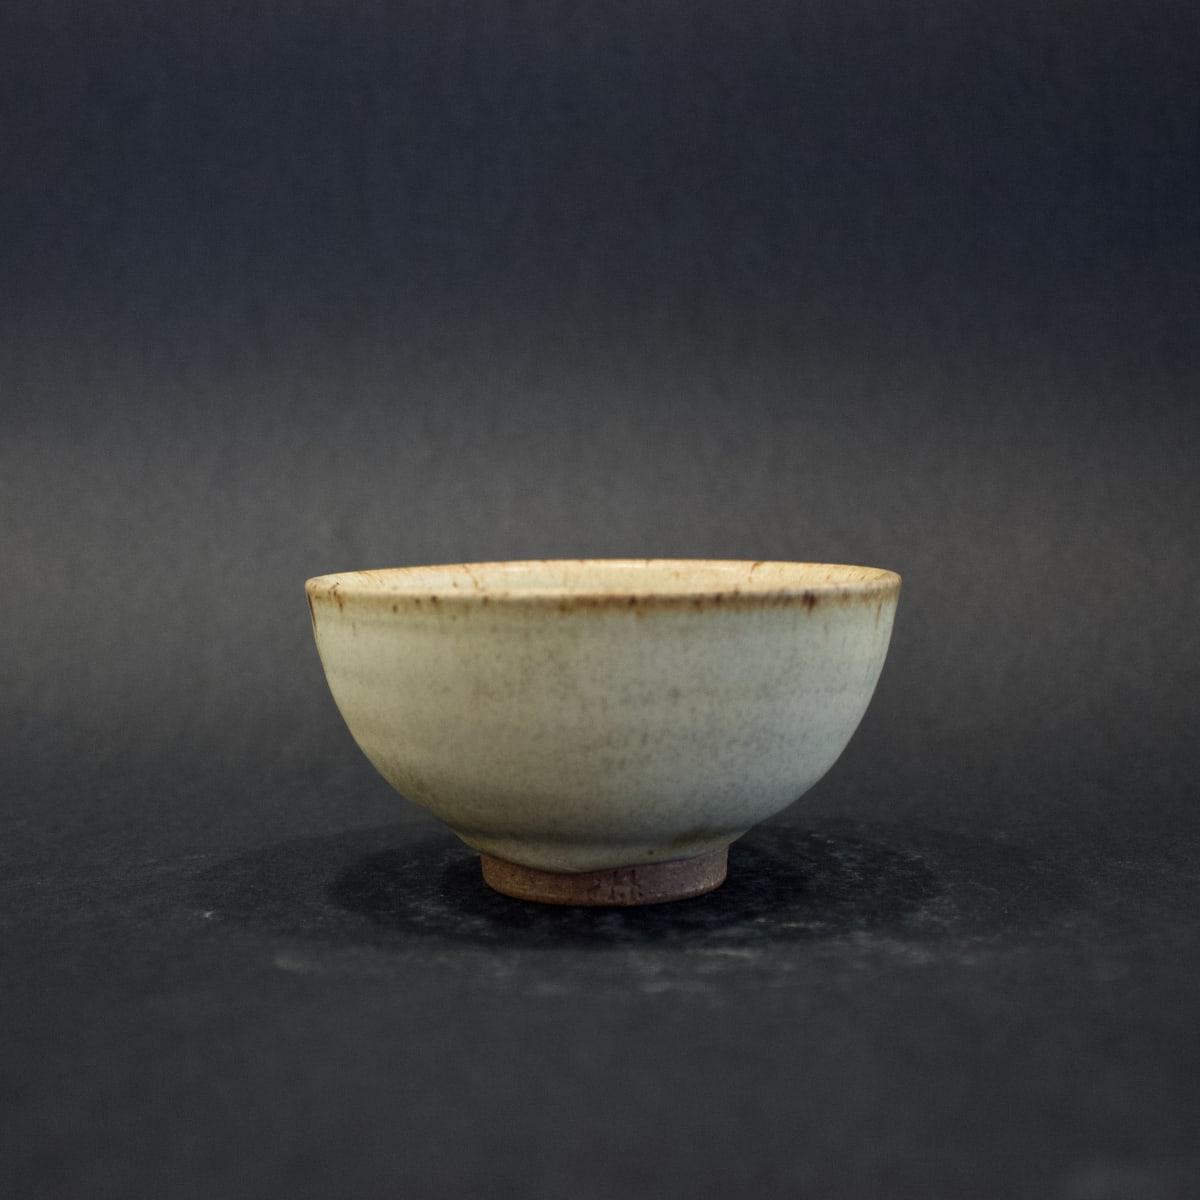 Ali Herbert Small Bowl, 2019 Ceramic Stoneware 6 x 9.5 x 9.5 cm 2 3/8 x 3 3/4 x 3 3/4 in